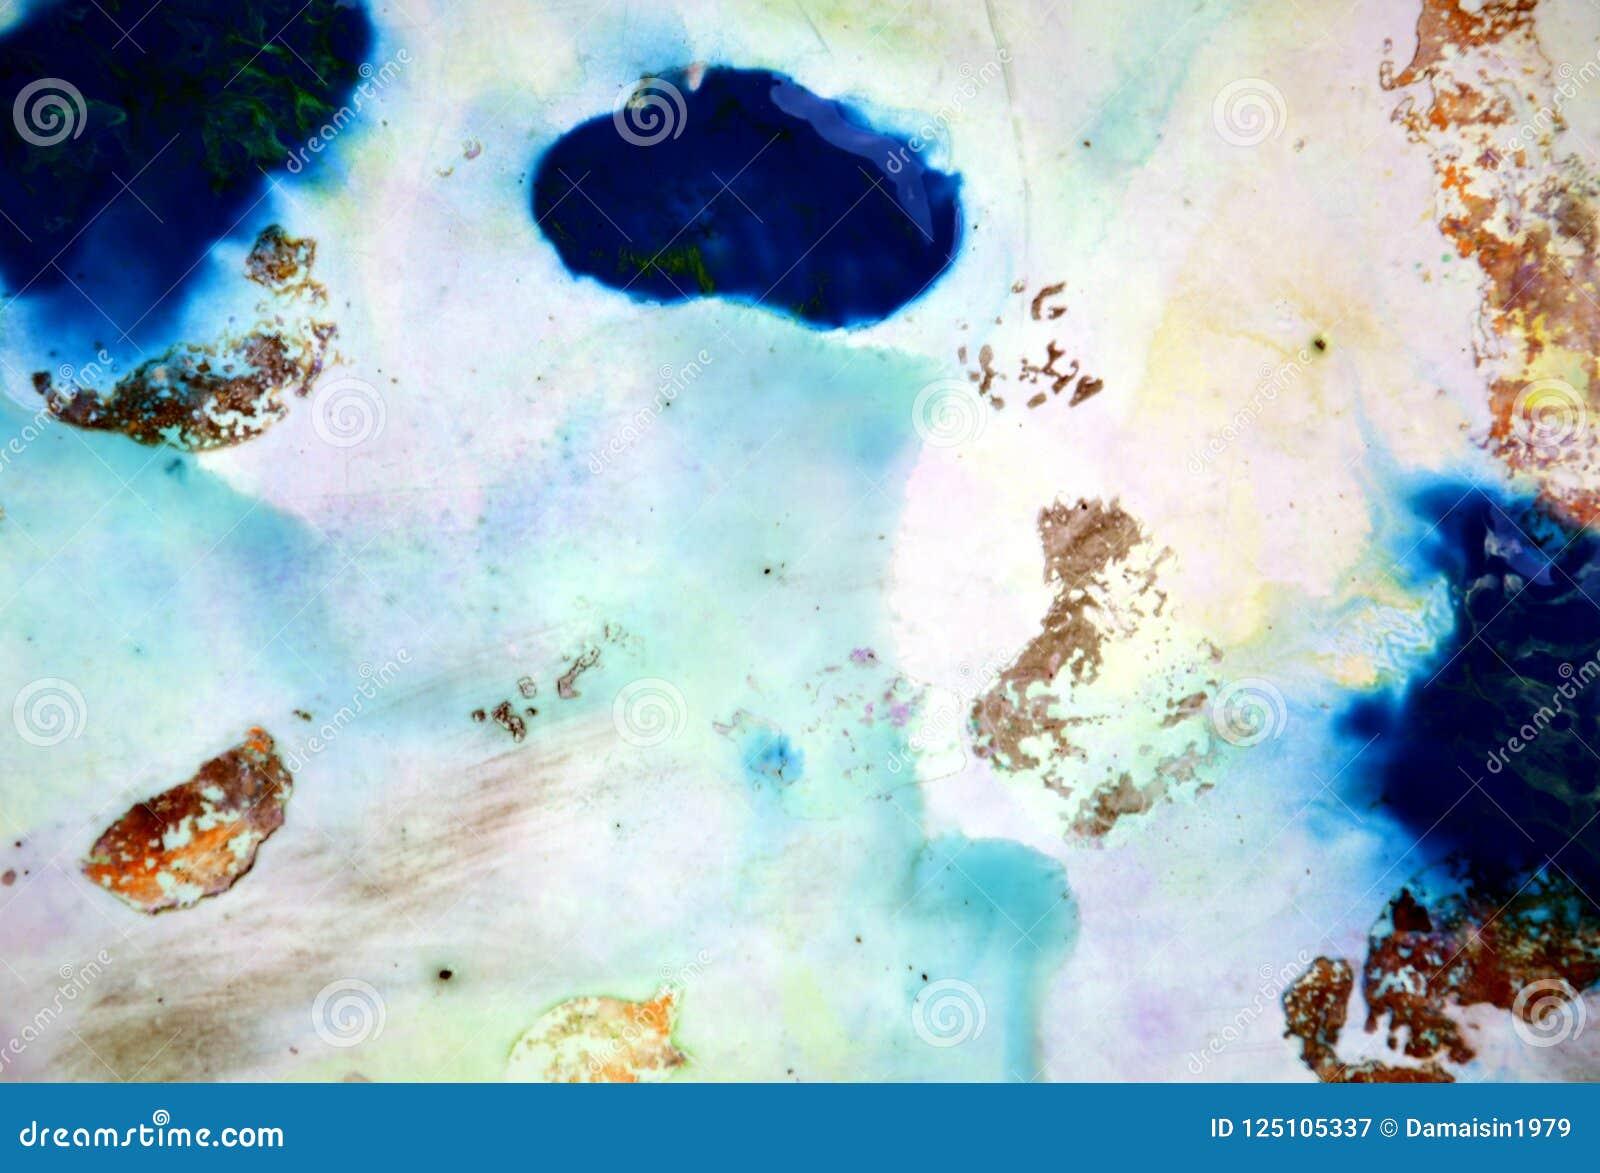 Formas de pintura em cores macias cinzentas azuis, fundo abstrato